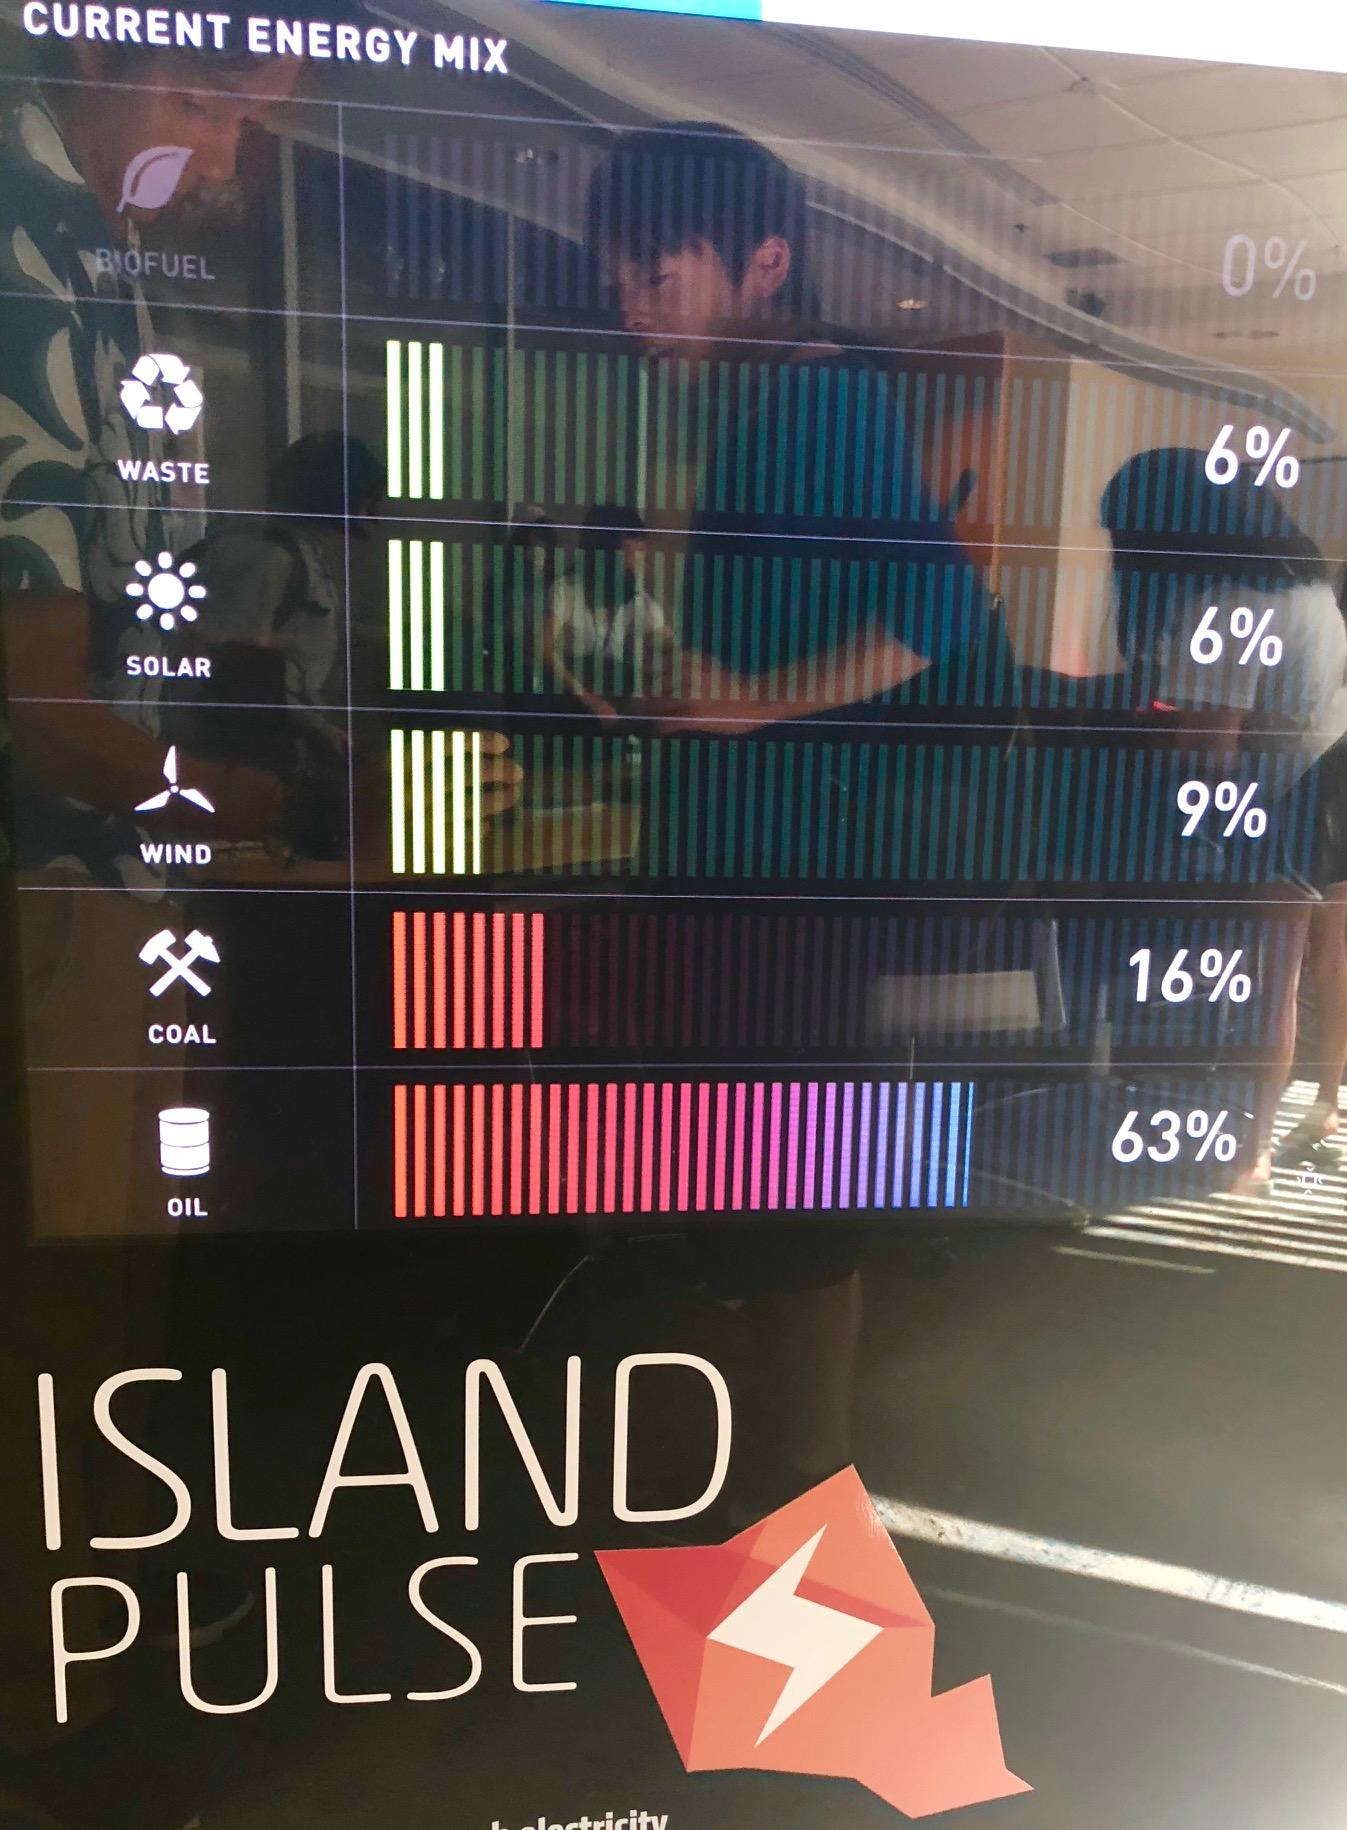 ISLAND PULSE